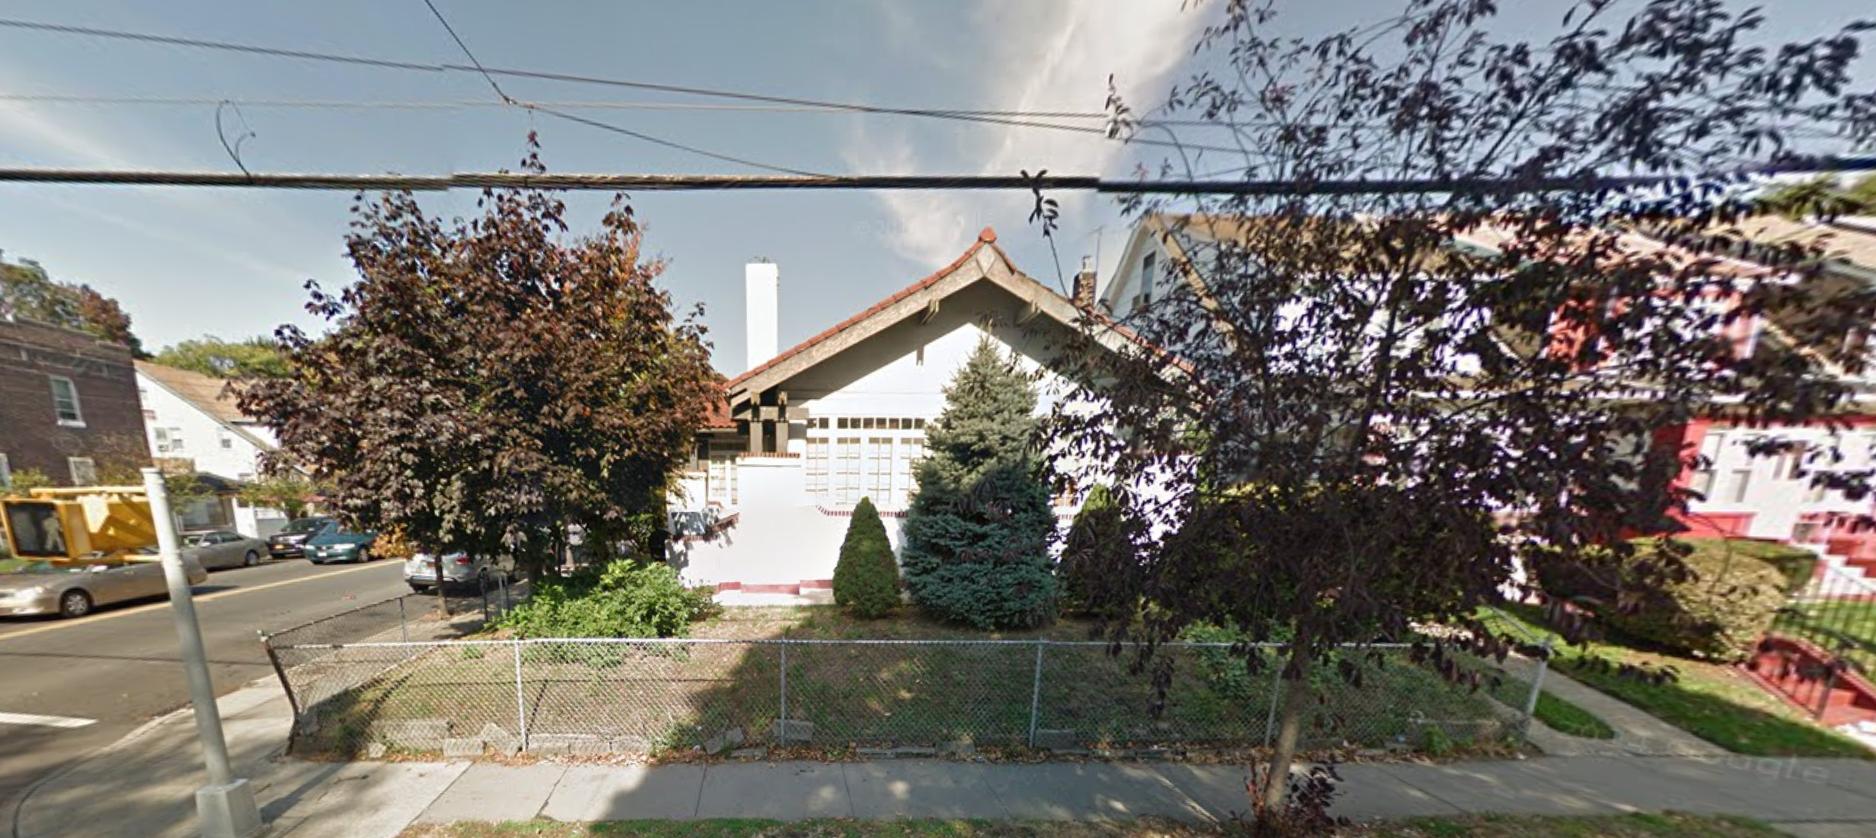 3603 Farragut Road, image via Google Maps